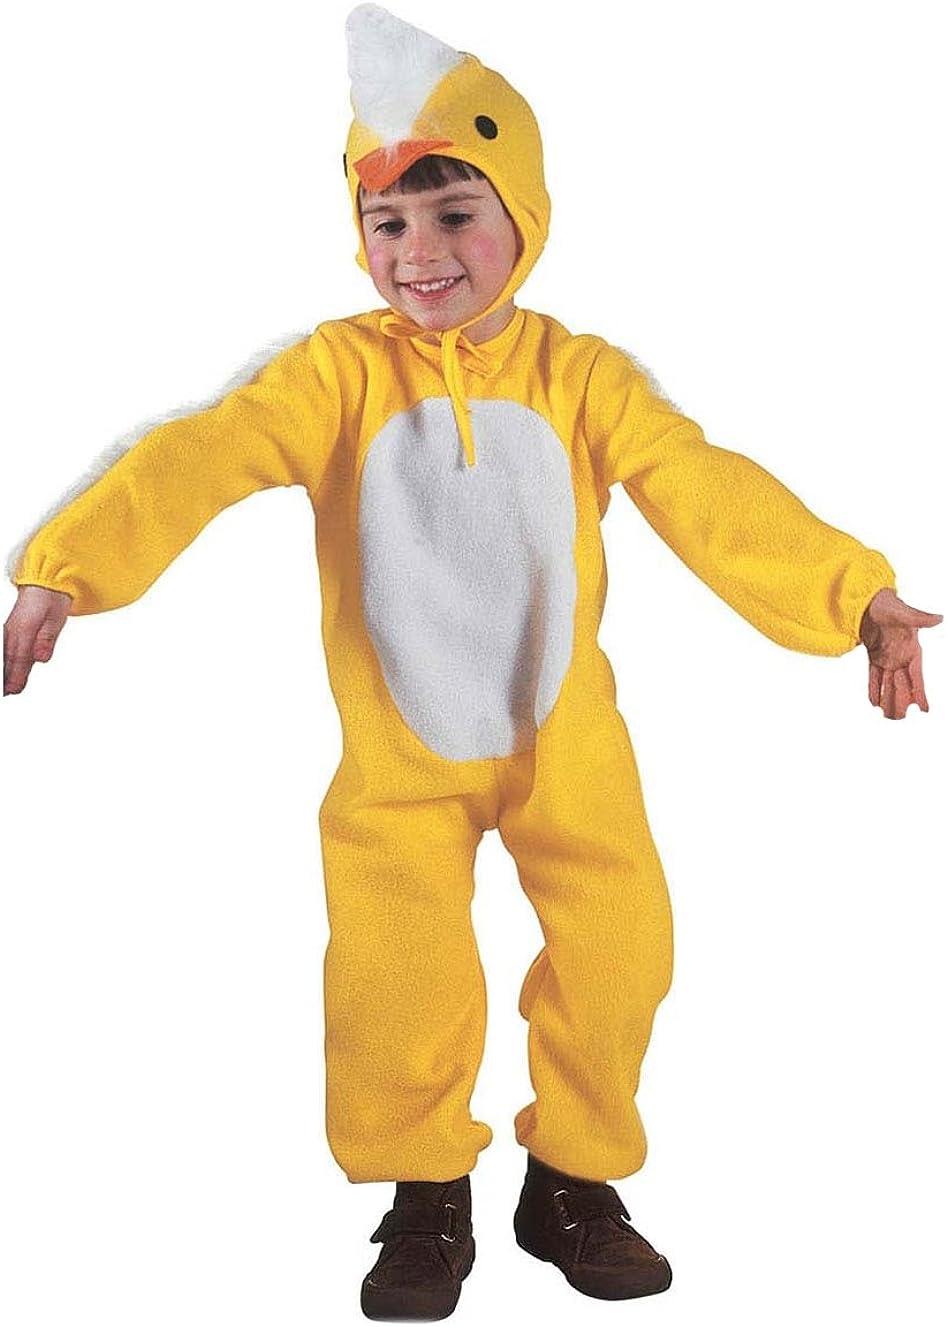 WIDMANN Disfraz Carnaval niño Disfraz niño Pollito Amarillo ...